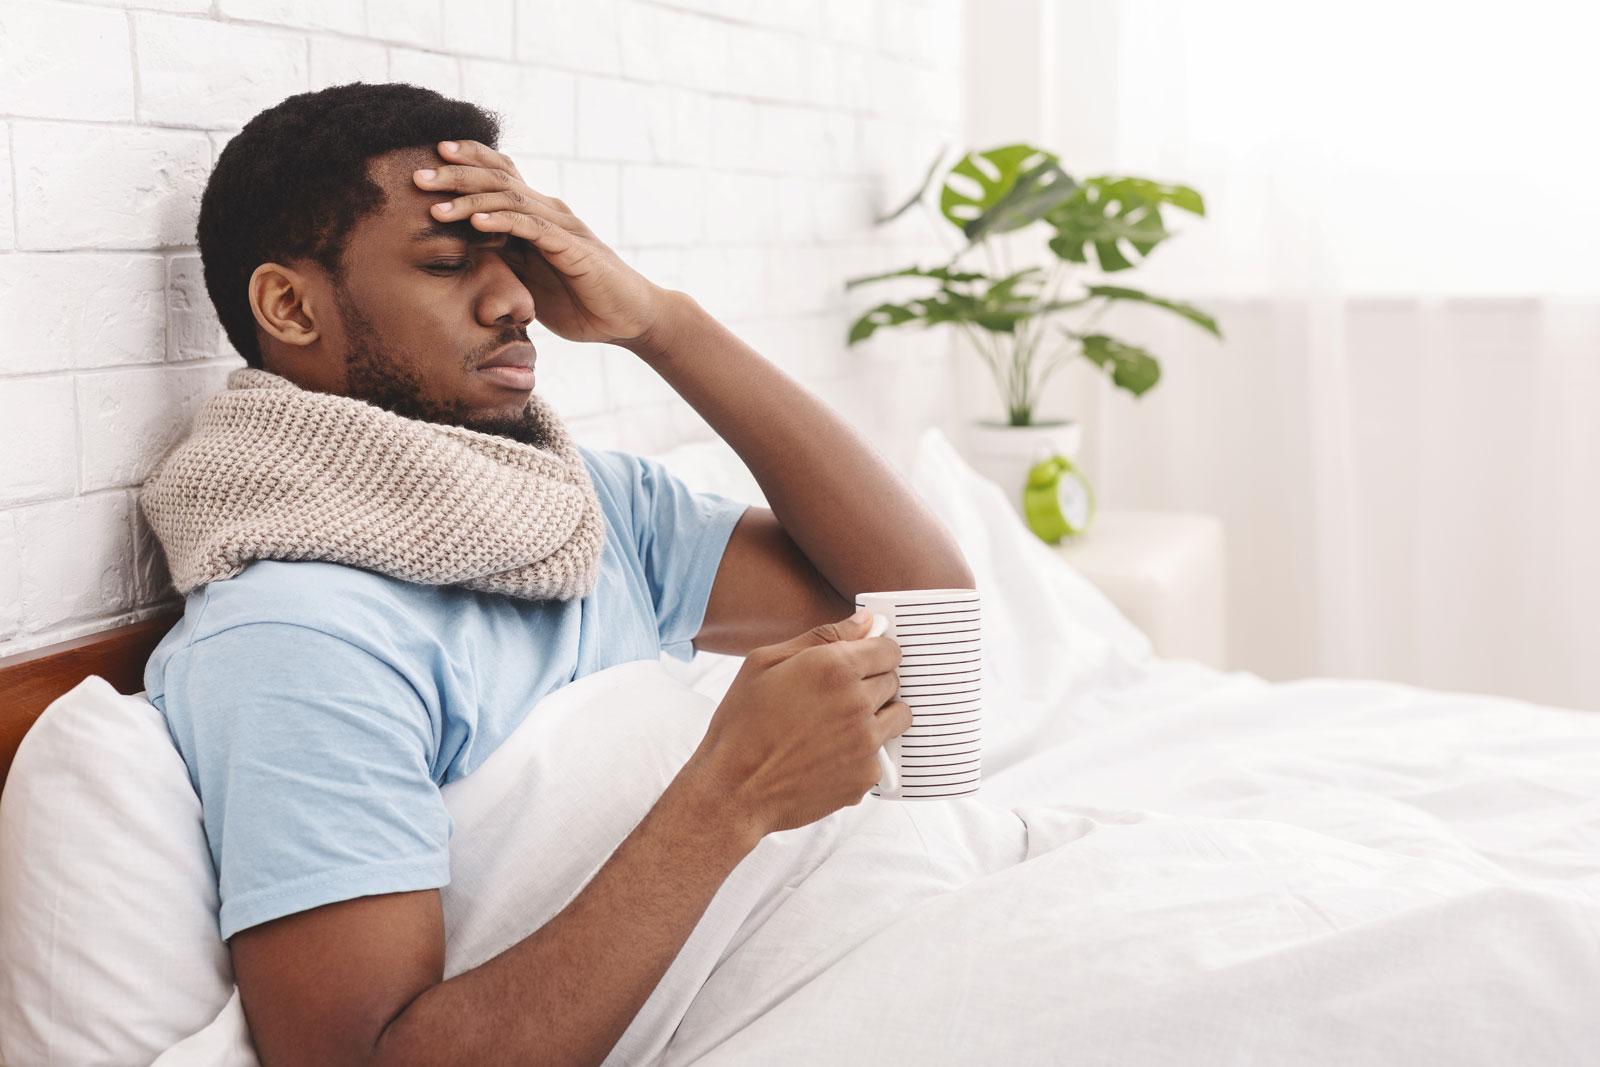 CBD_Flu_Season_9_23_21